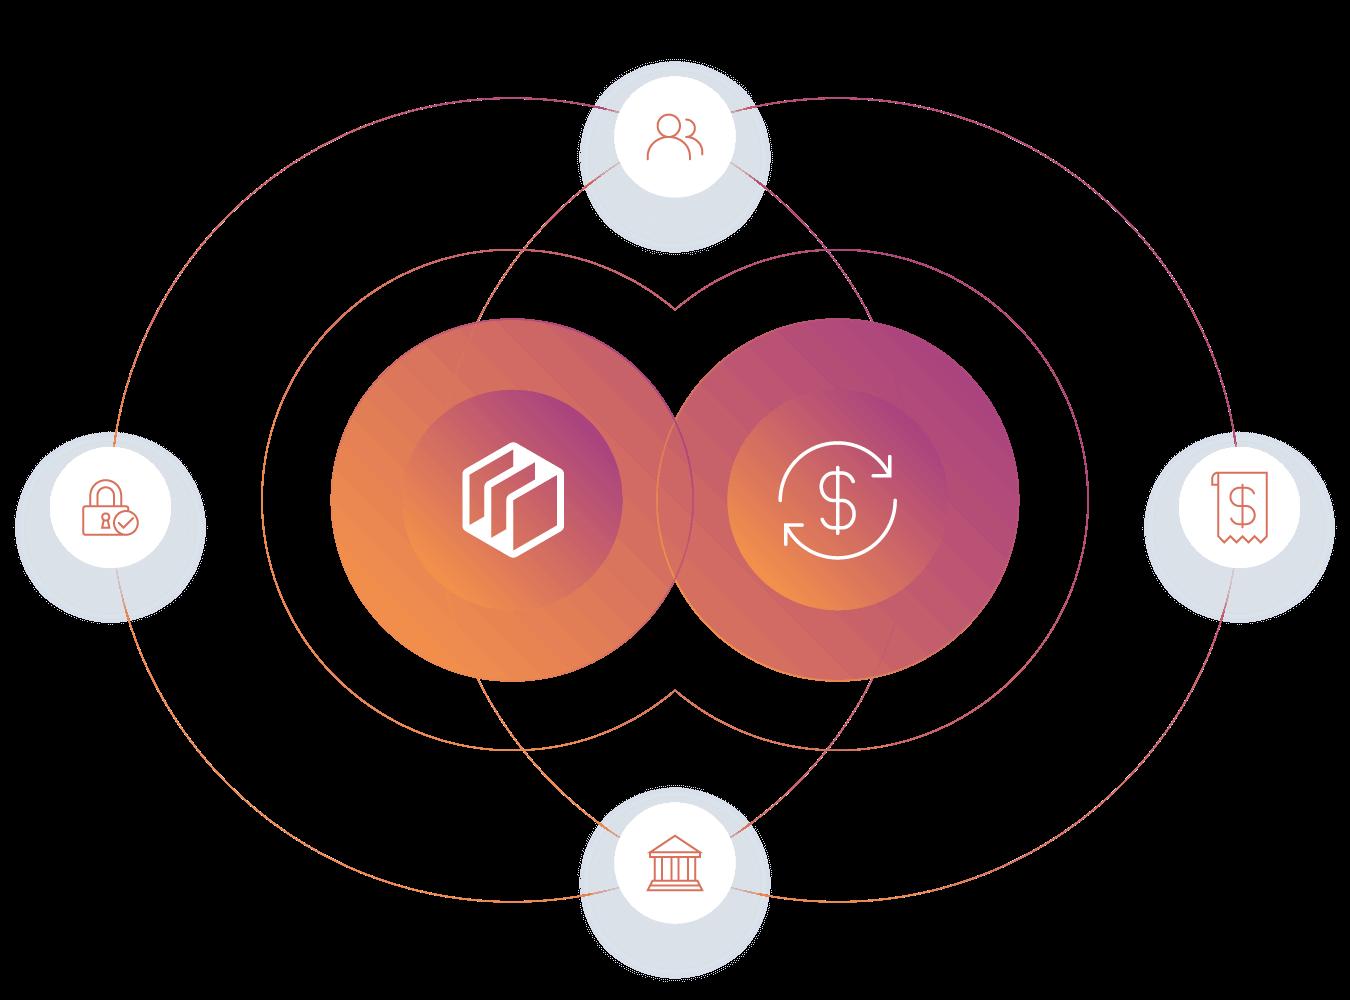 reseller partnerships image